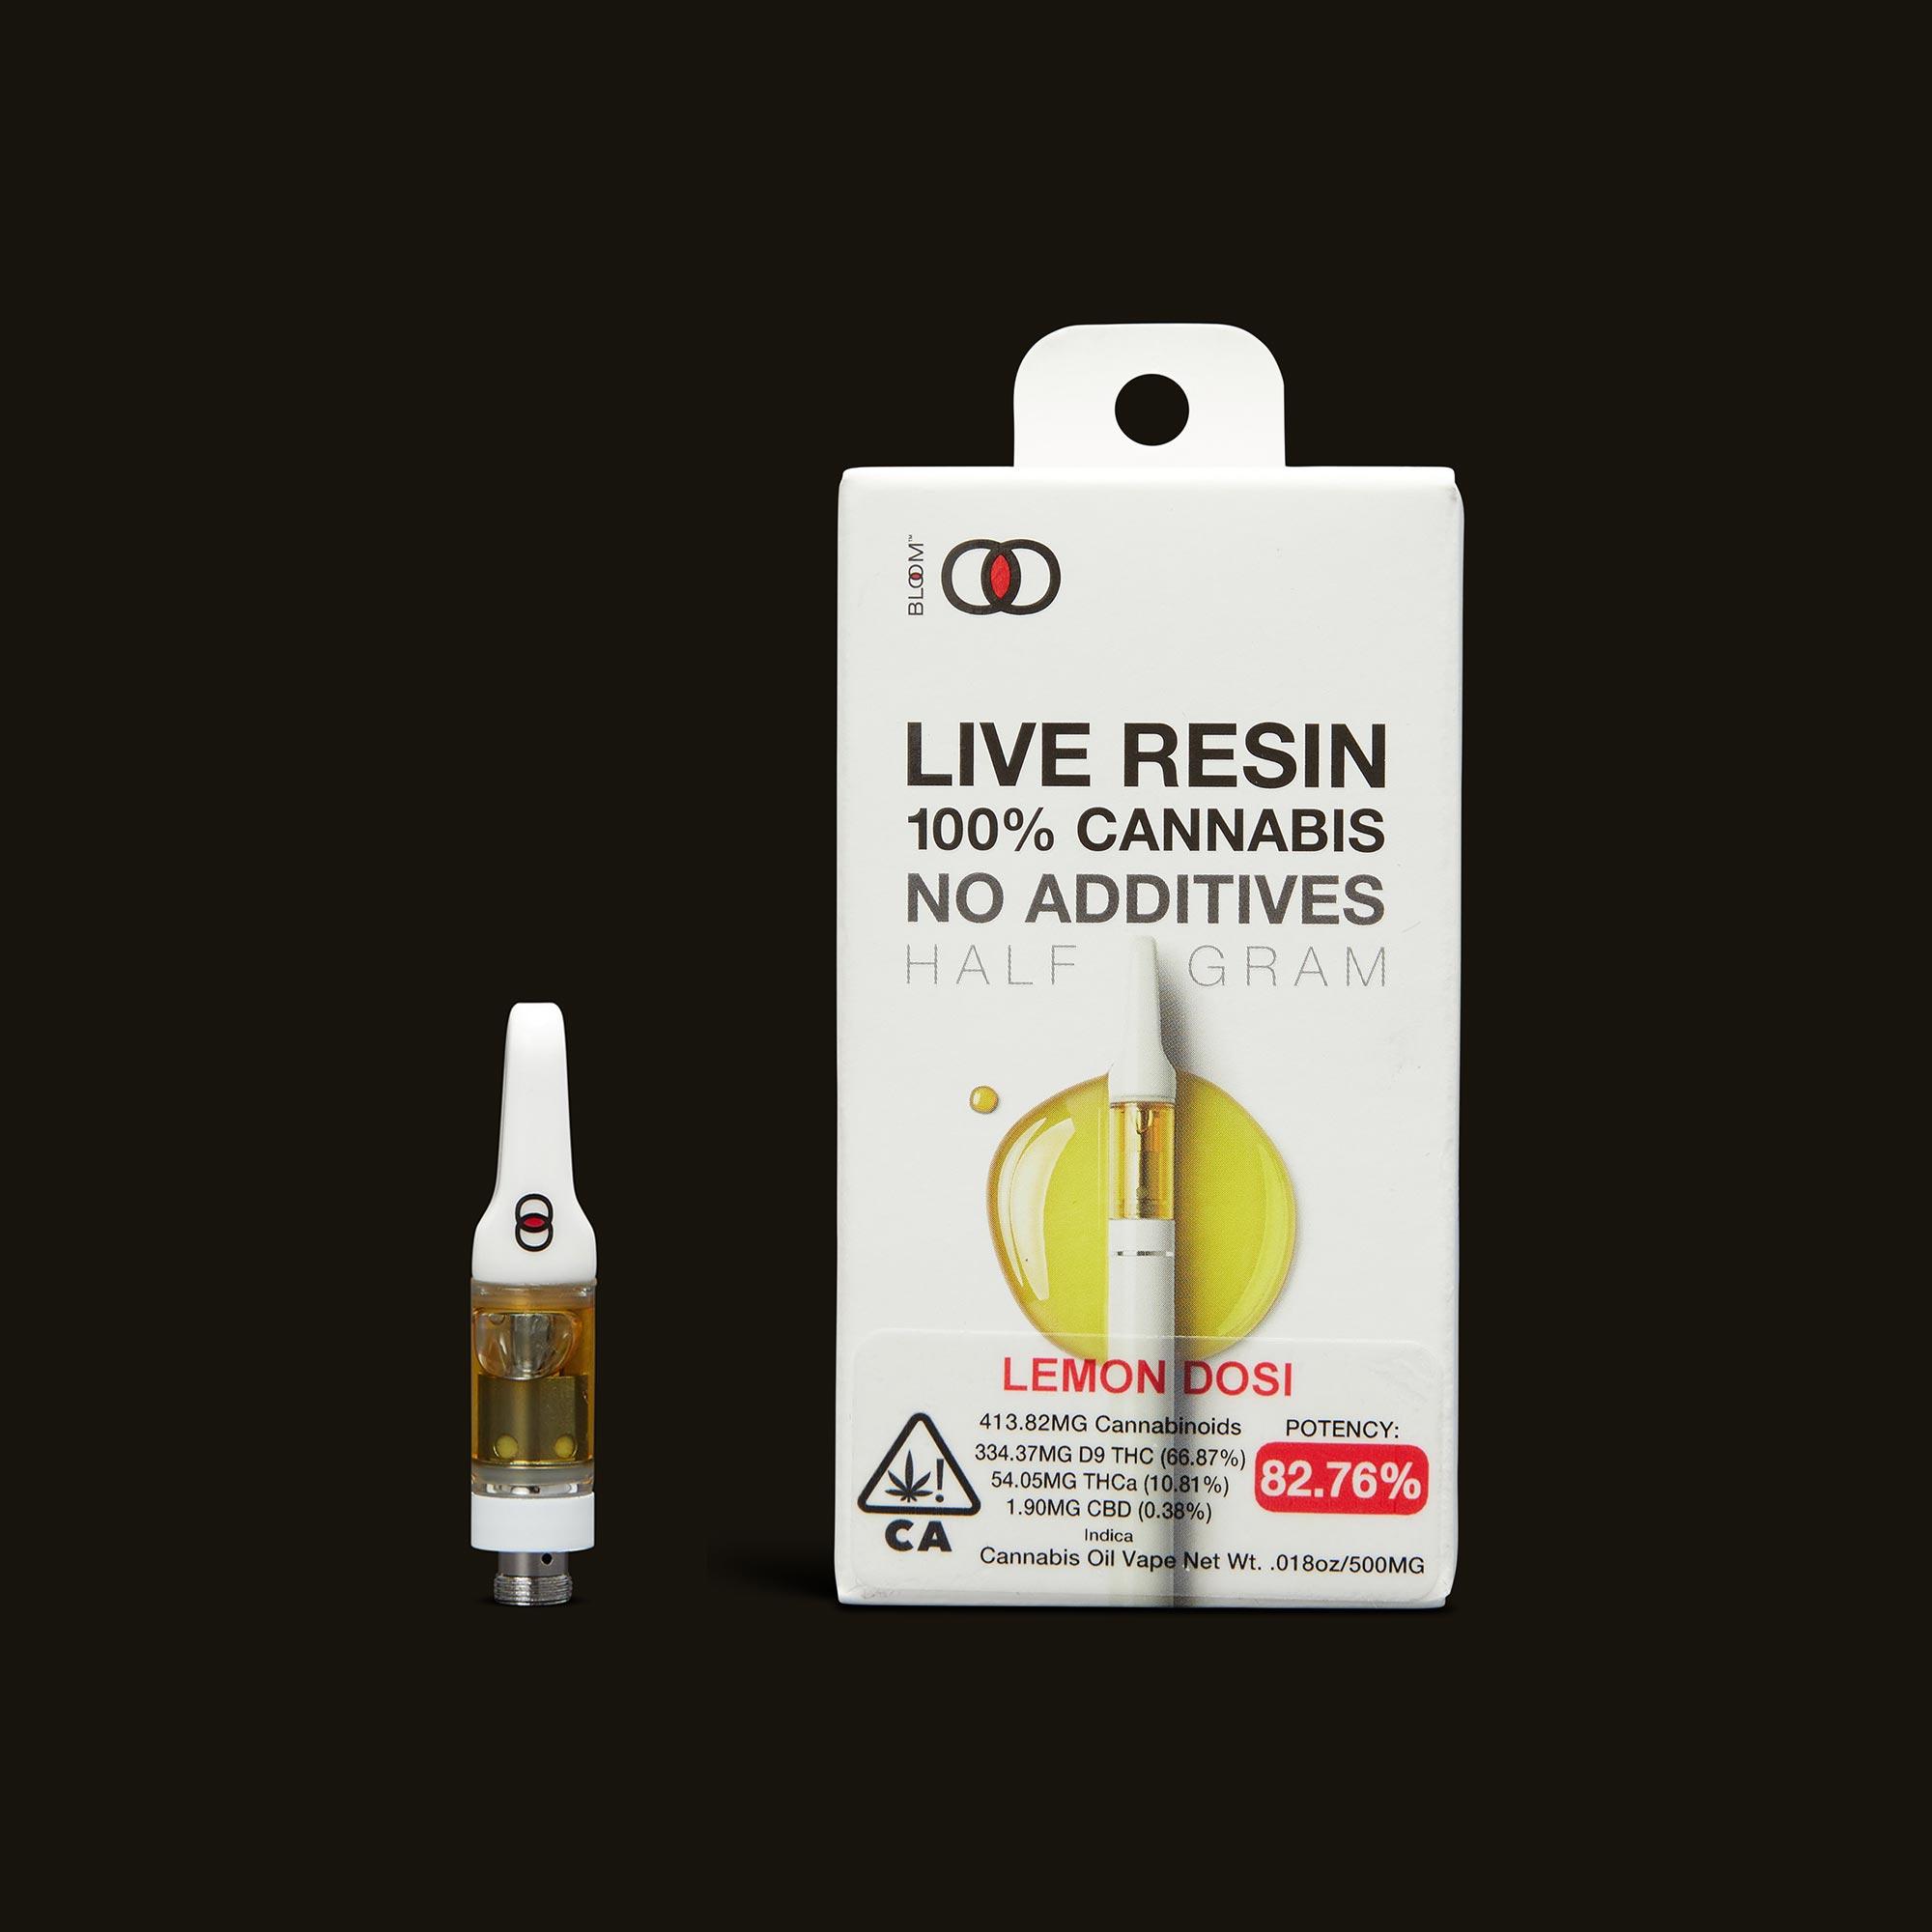 Lemon Dosi Live Resin Cartridge - .5g by Bloom Brands